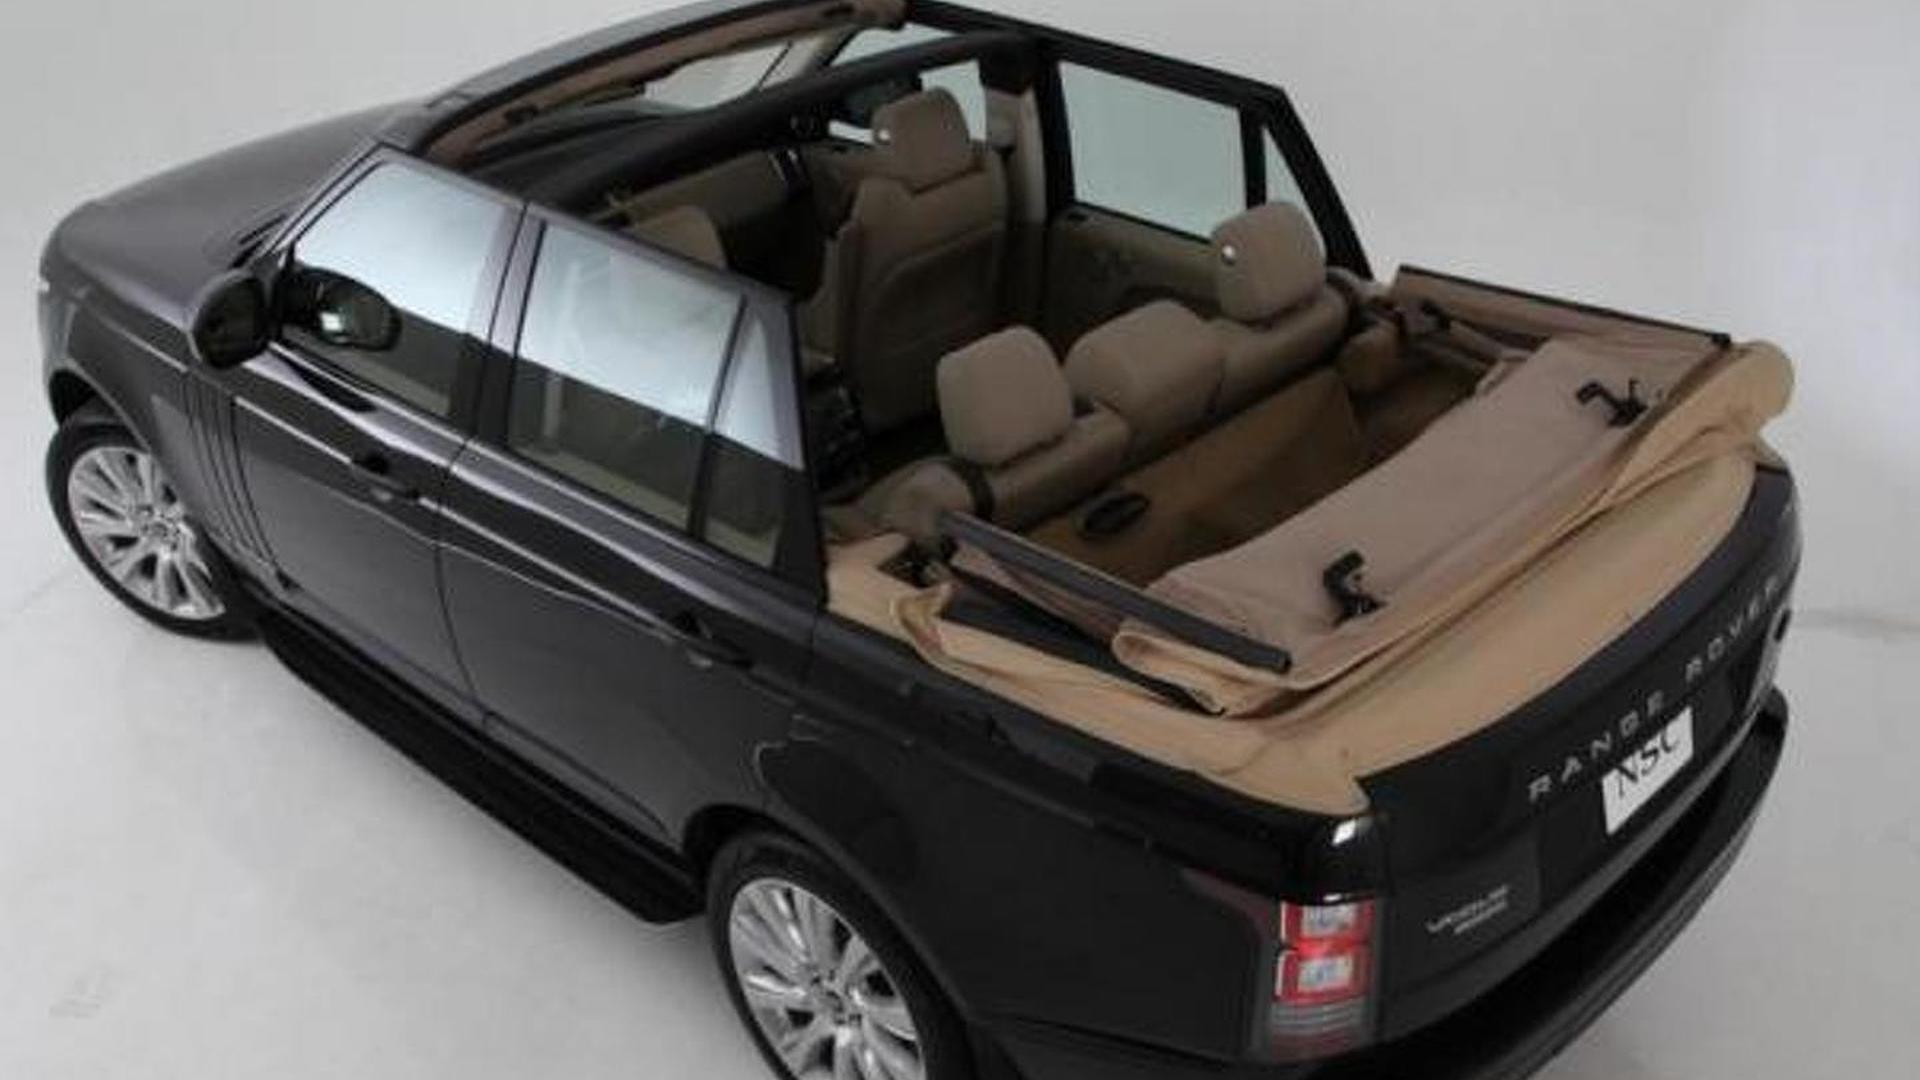 Newport unveils their Range Rover Convertible